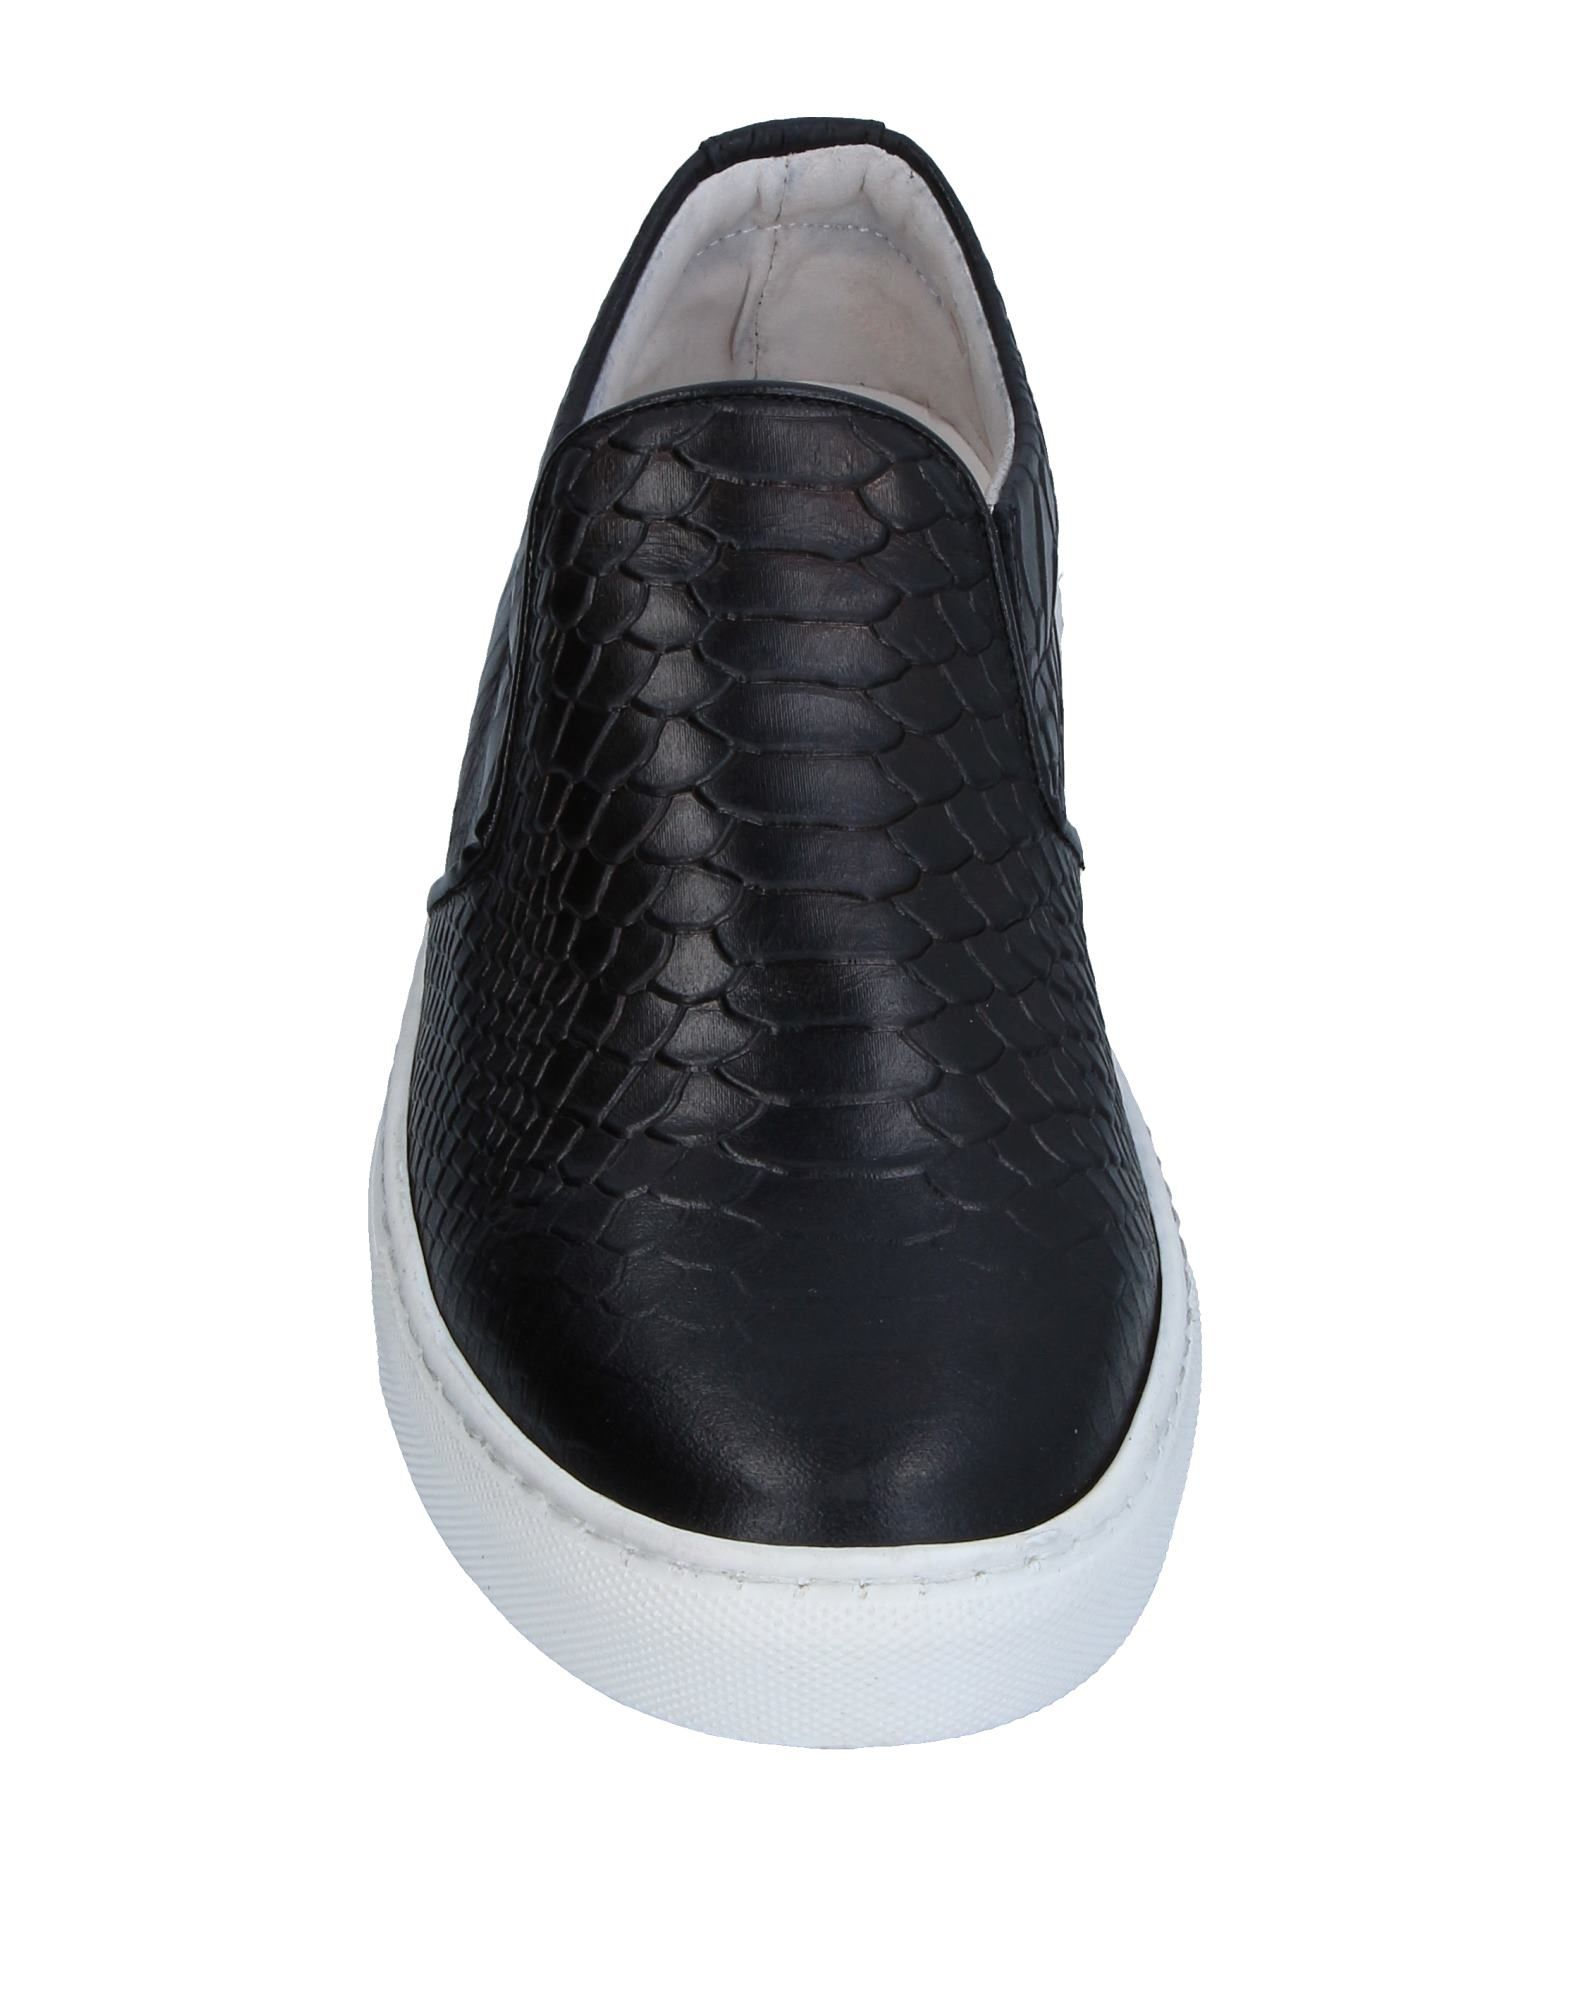 Sneakers Brian Dales Homme - Sneakers Brian Dales sur ...